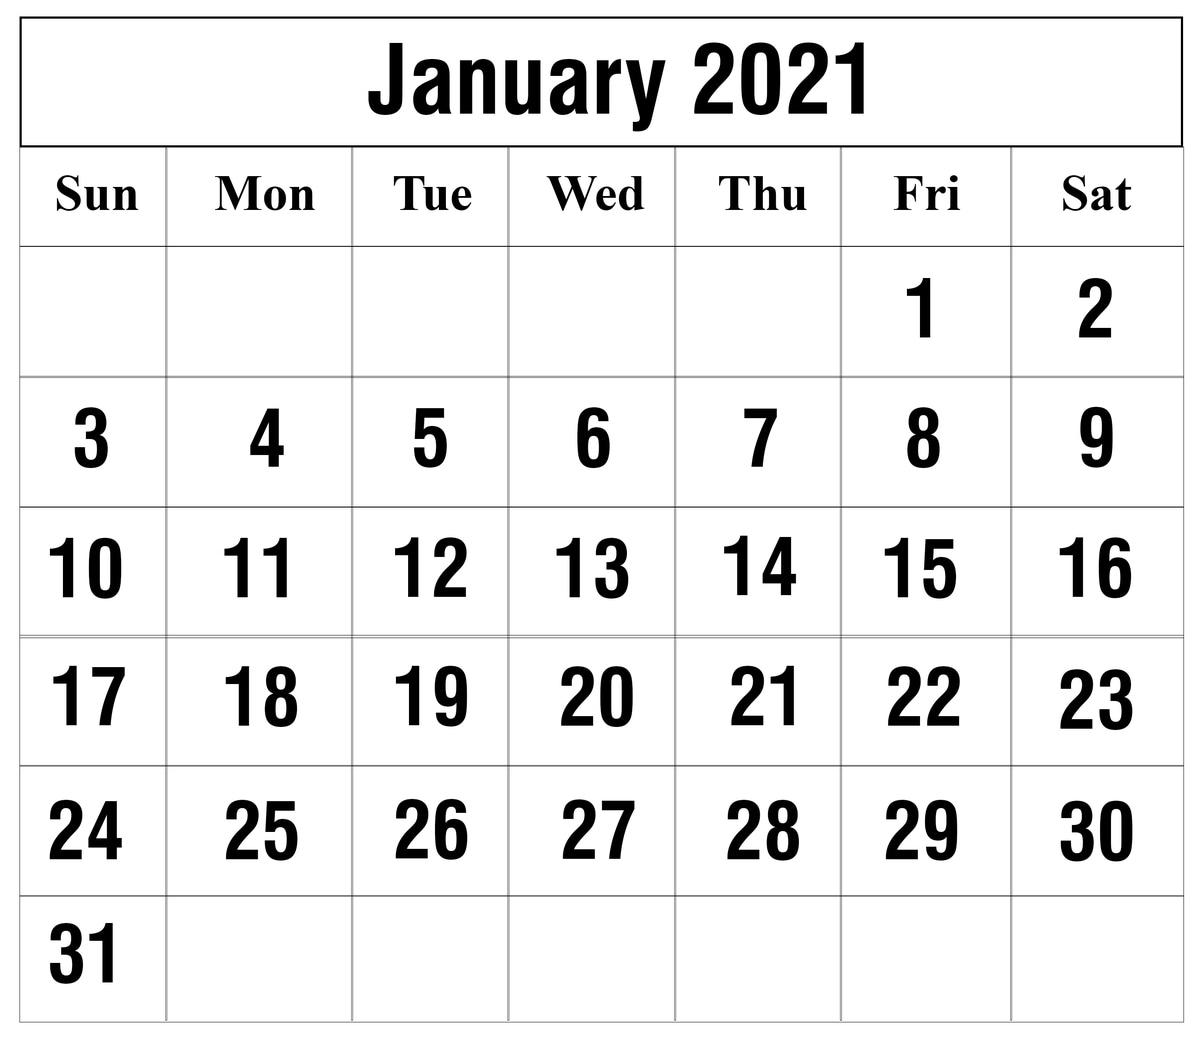 Julian Calendar 2021 Printable - Calendar Inspiration Design